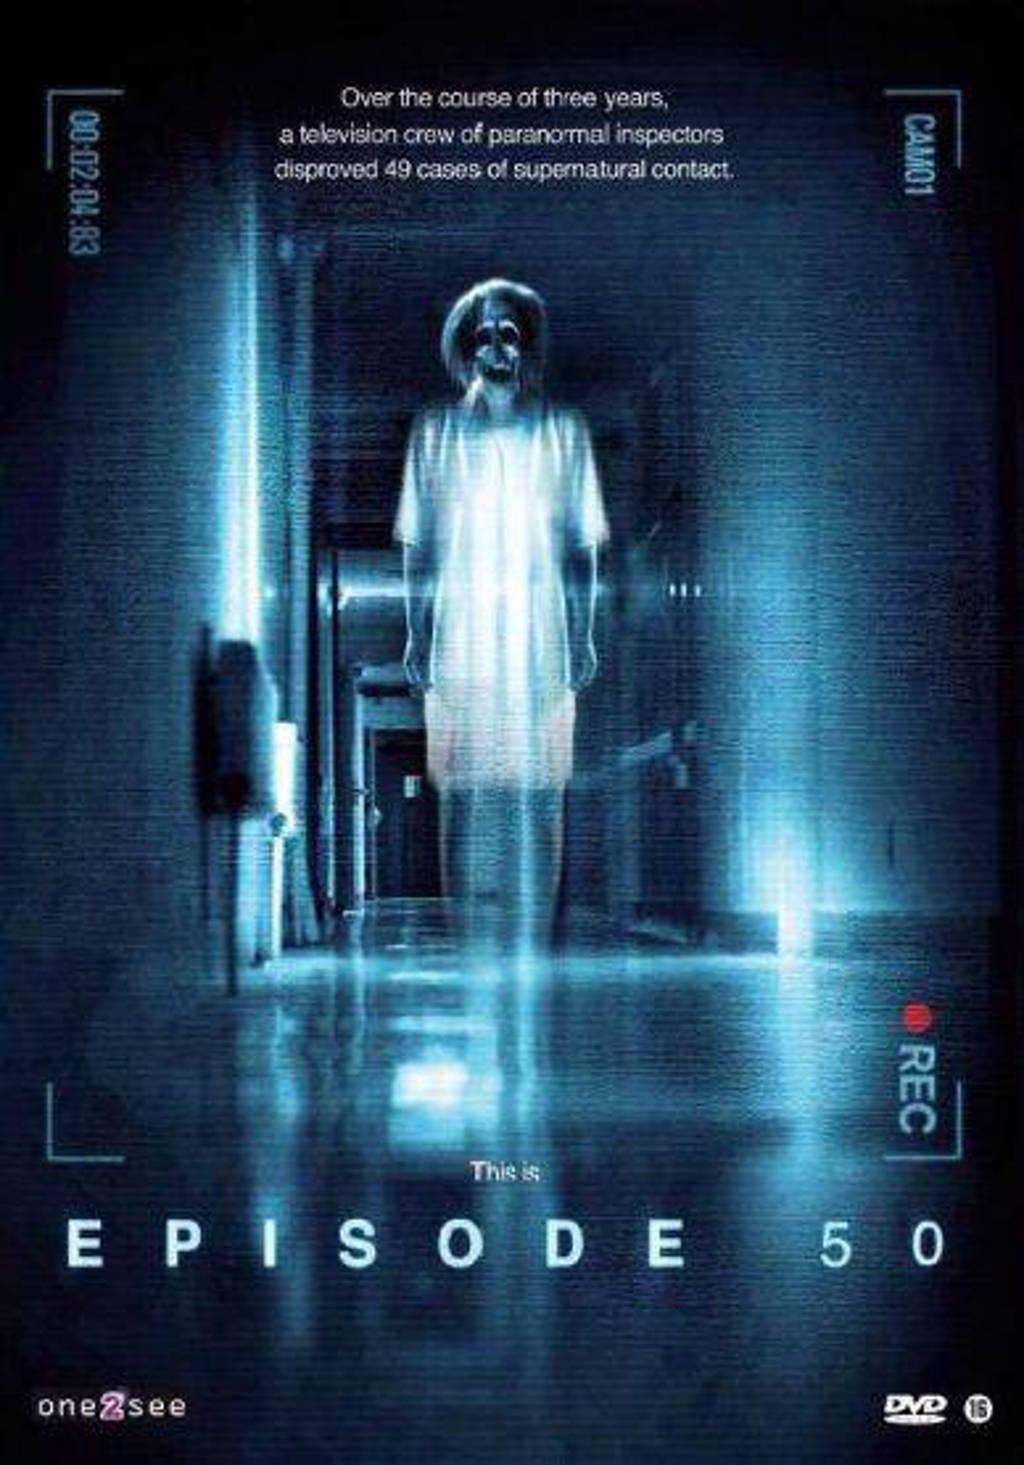 Episode 50 (DVD)